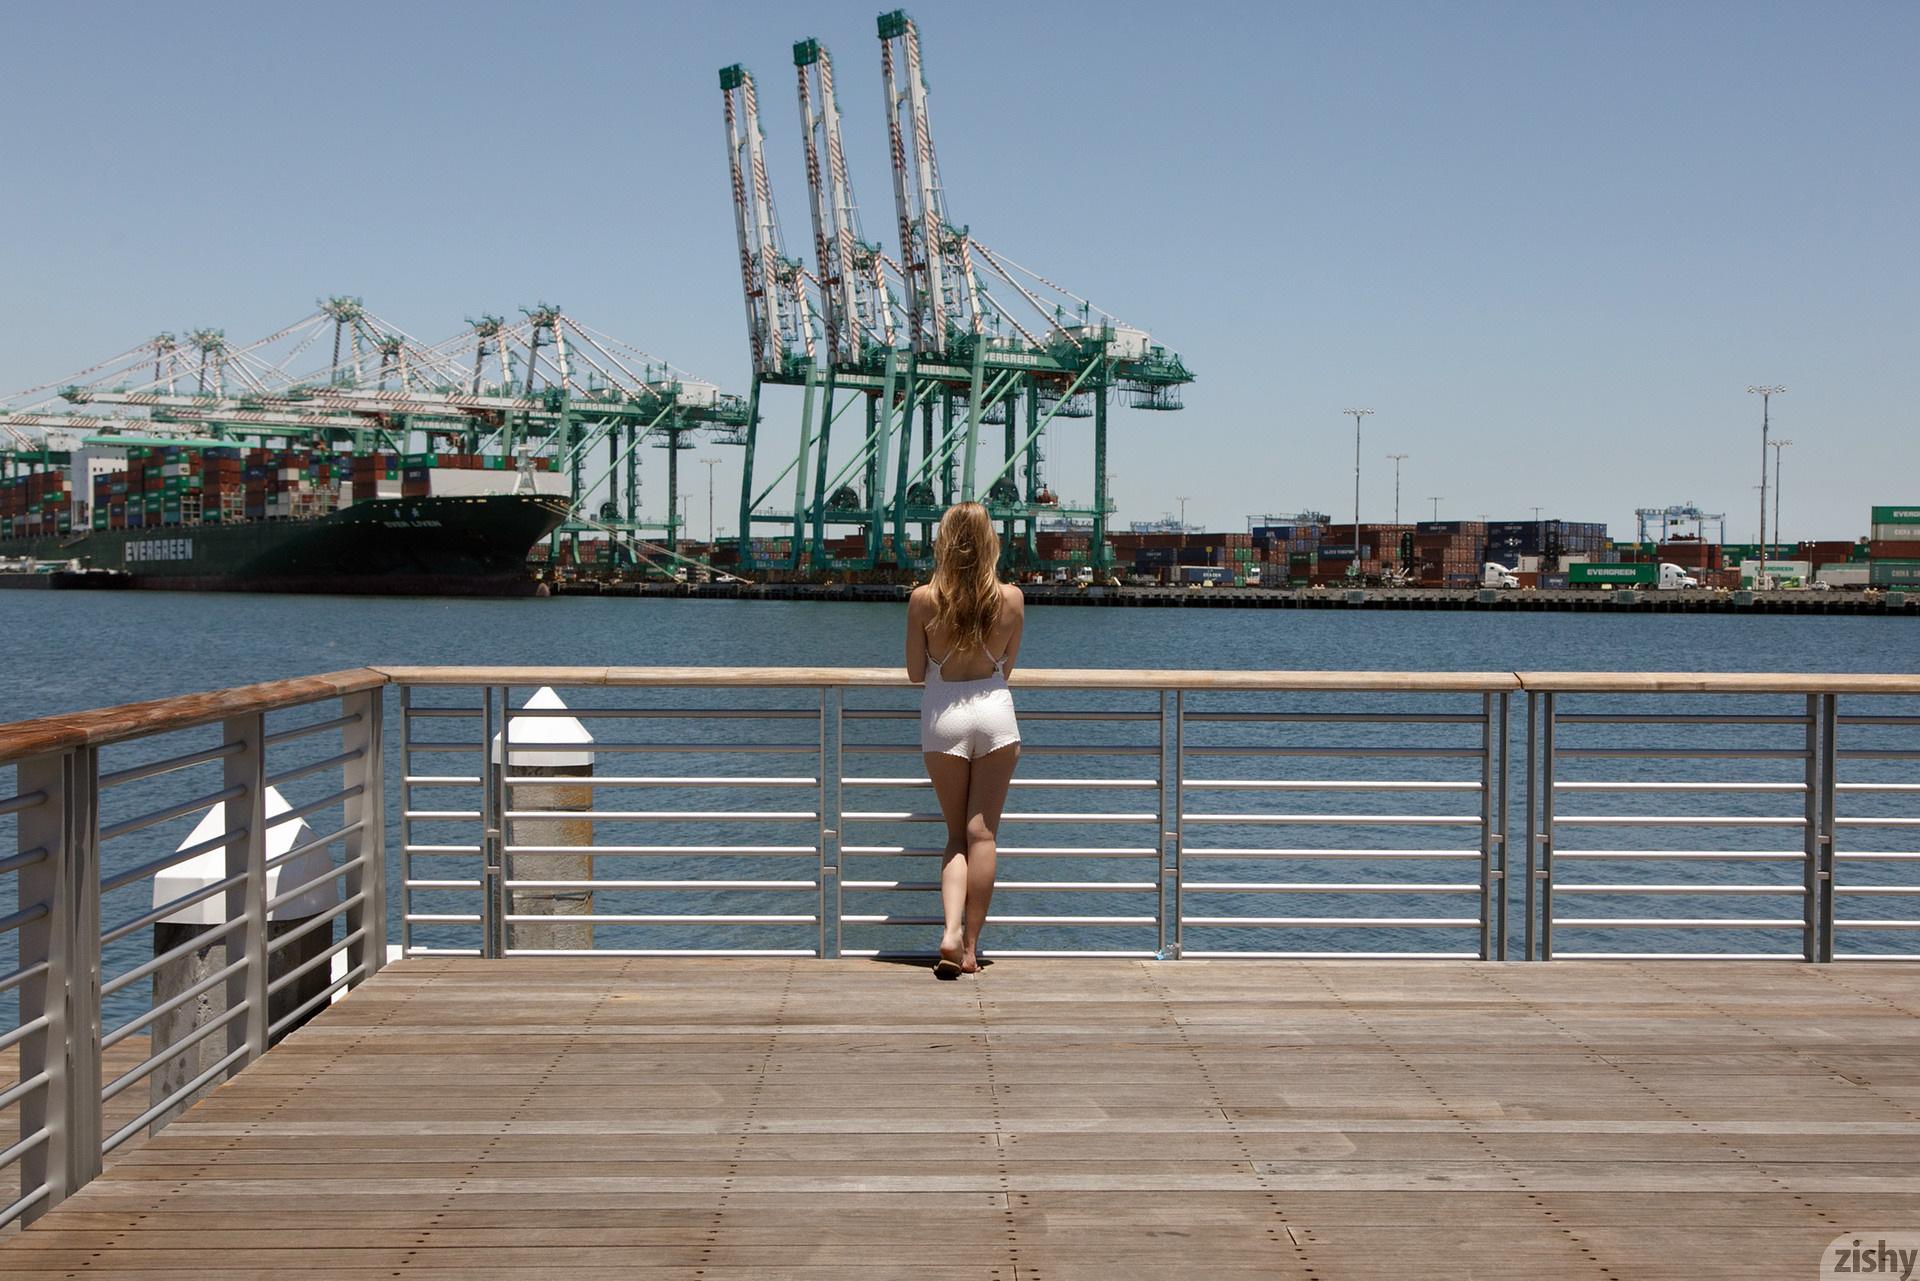 Ashley Lane Terminal Island Zishy (26)